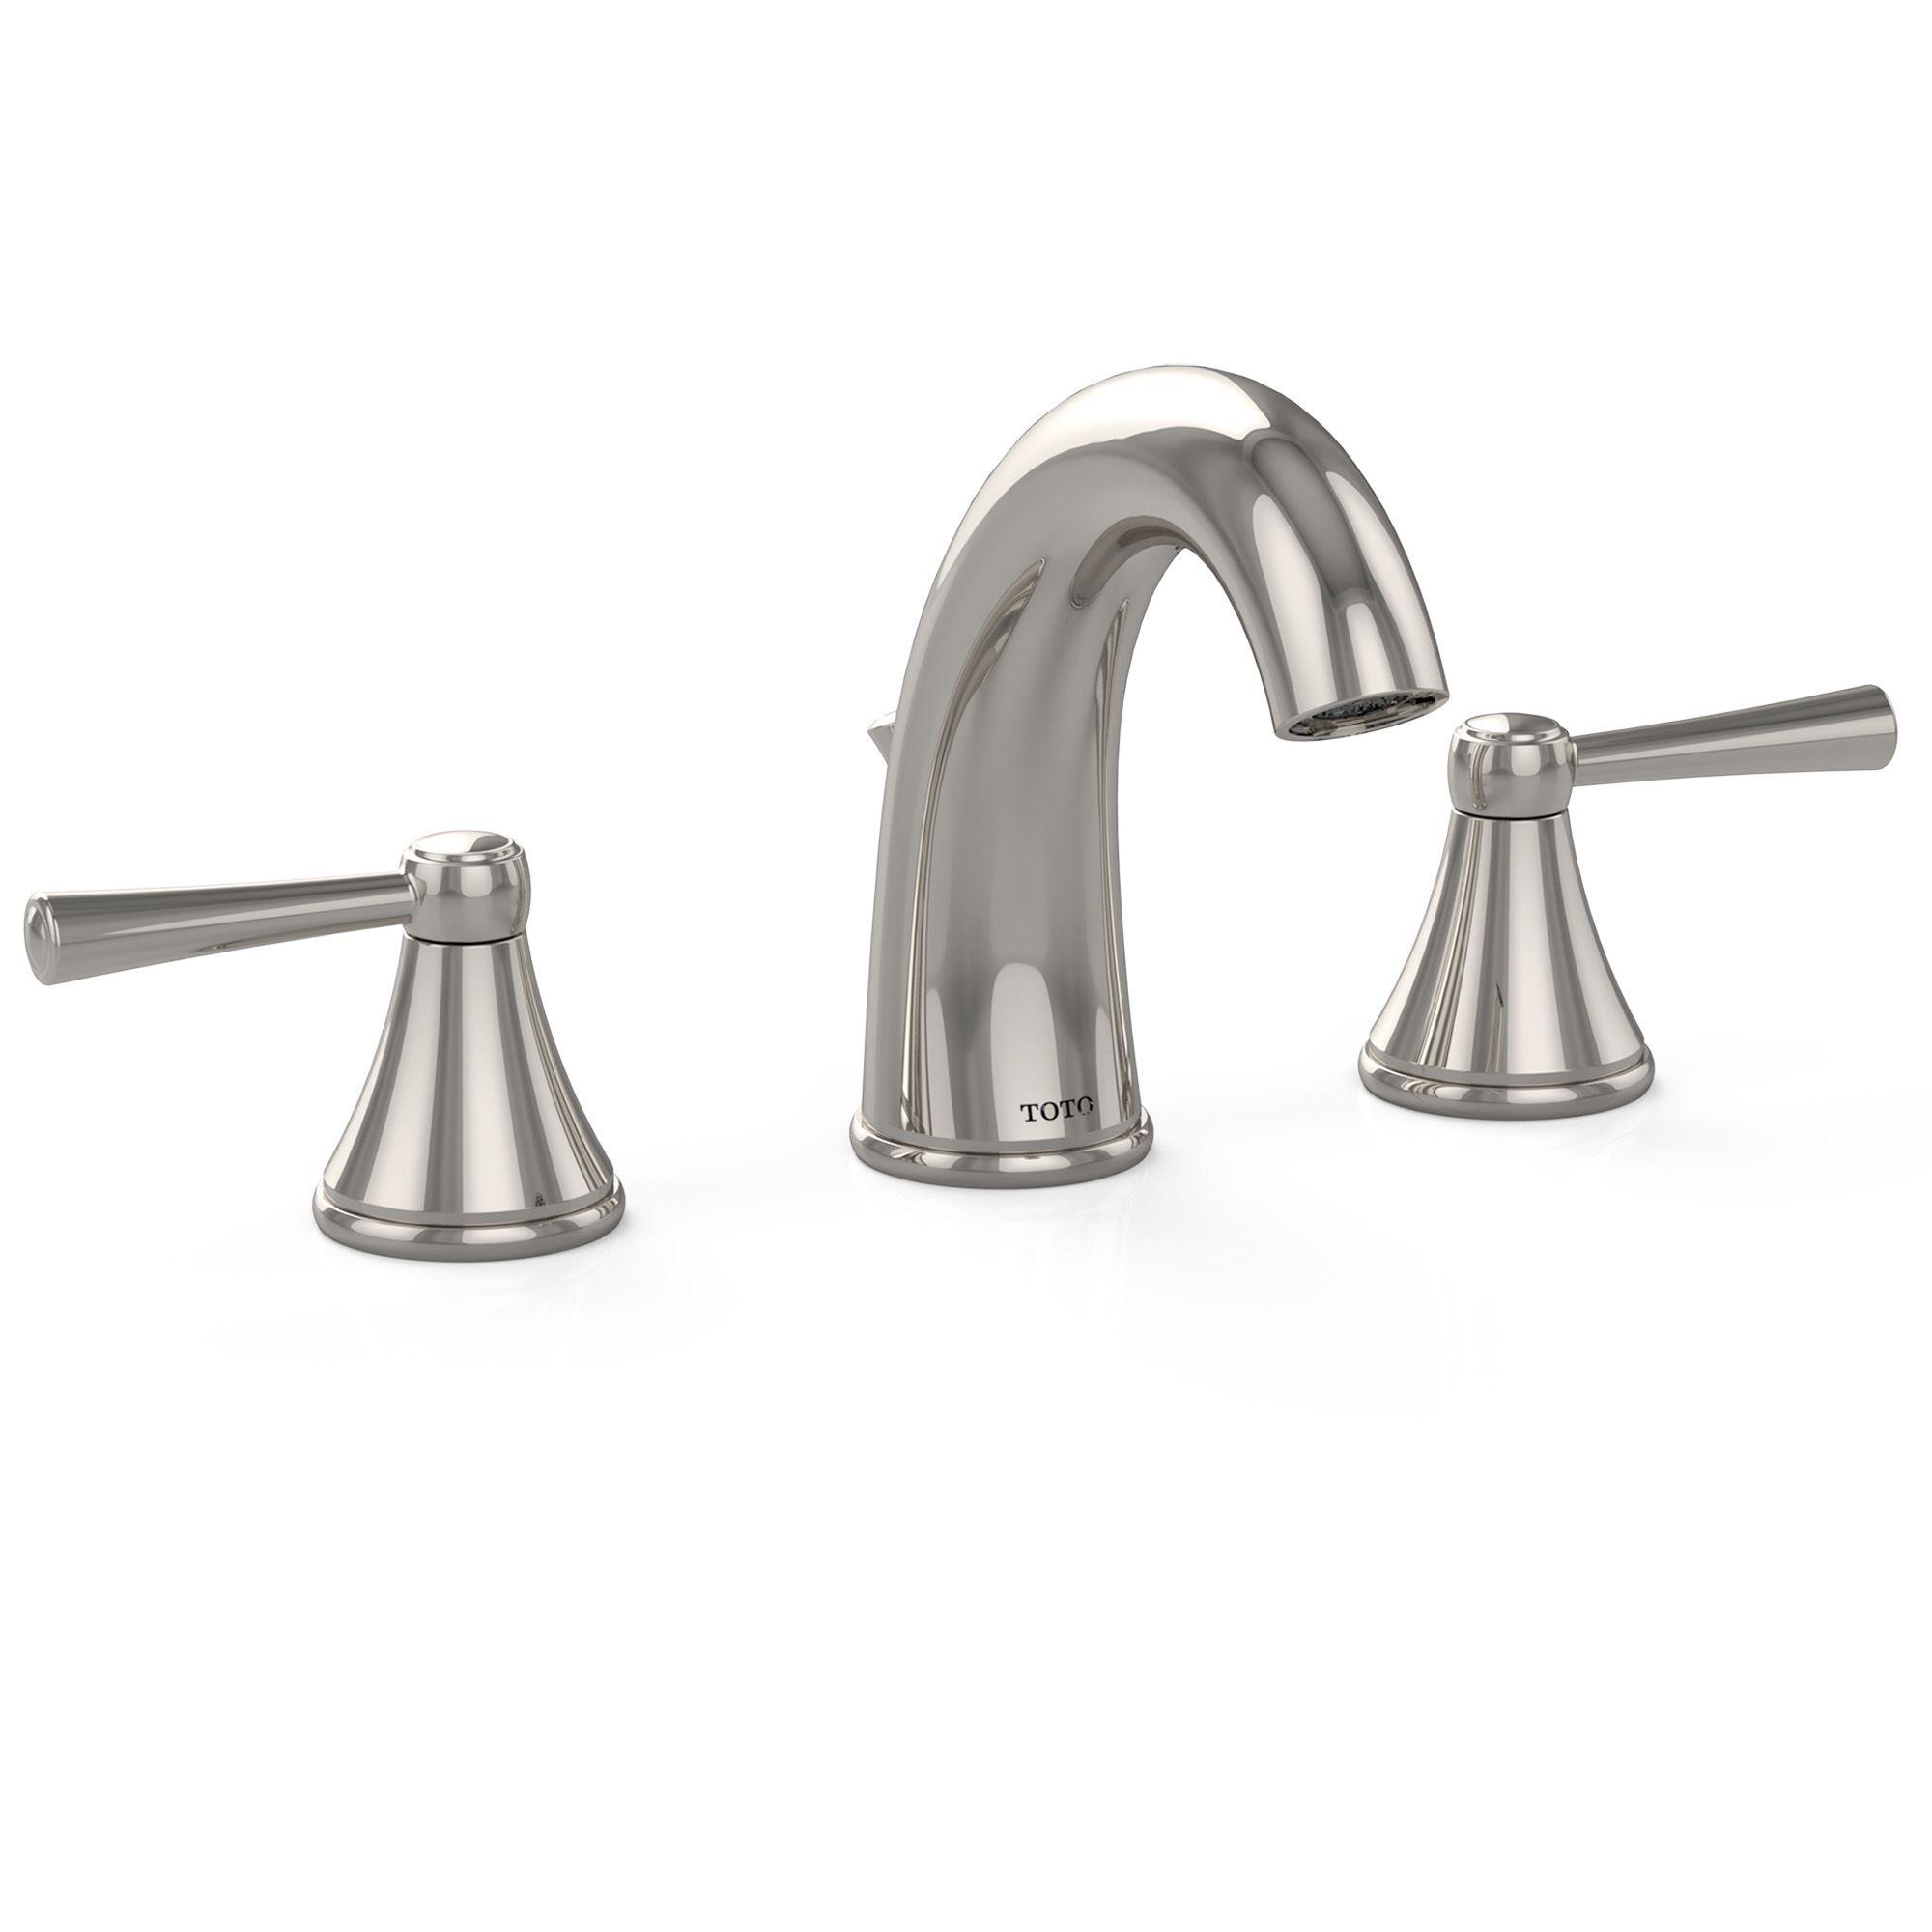 Toto Silas Two Handle Widespread 1 2 Gpm Bathroom Sink Faucet